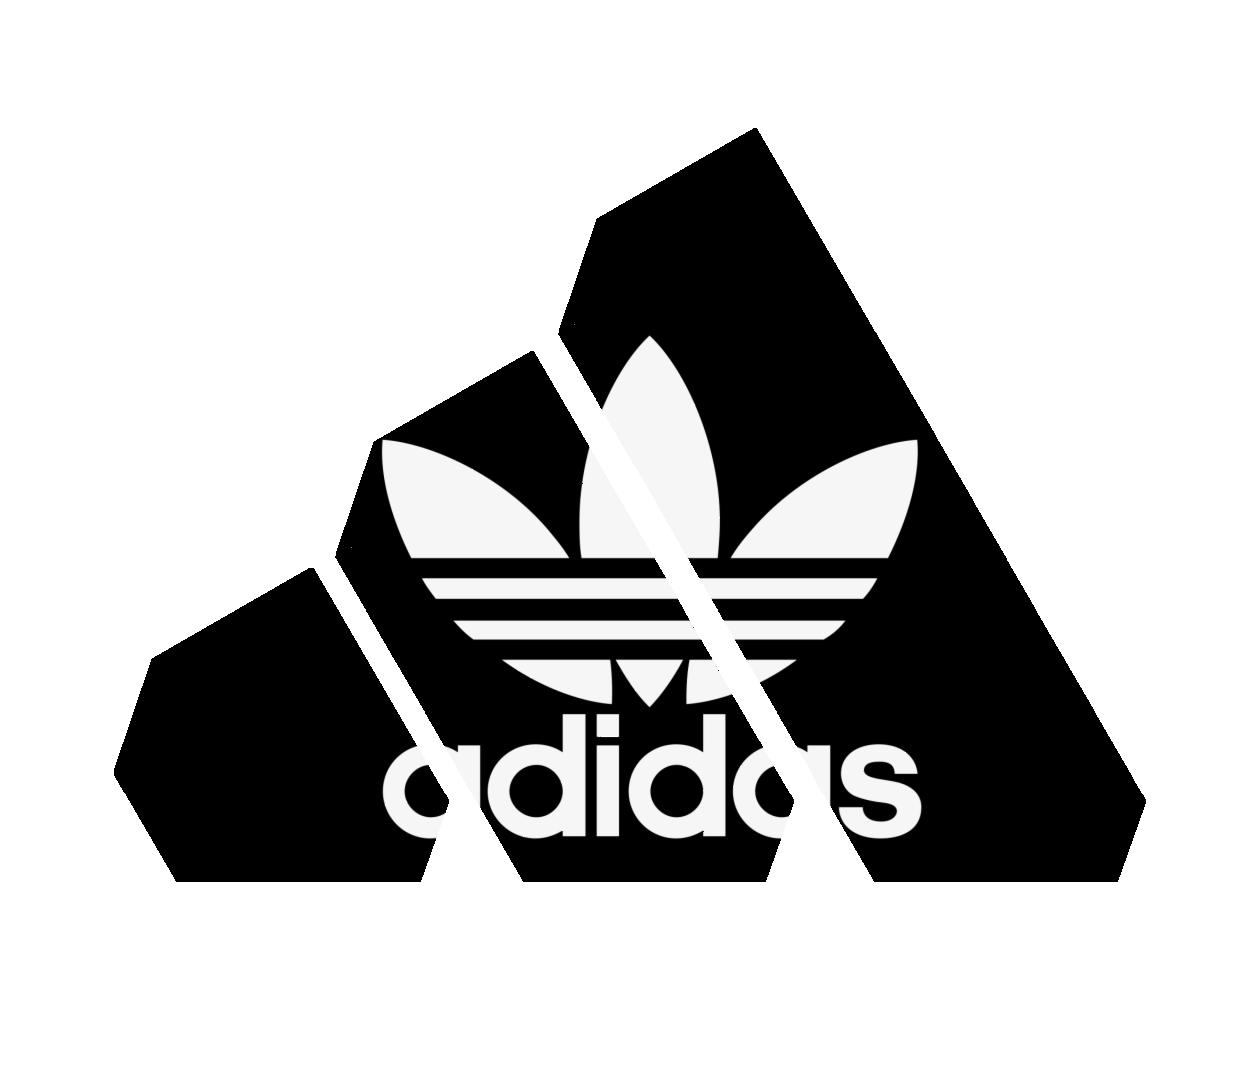 Adidas 2021 Logo New Design Hd I Phone Wallpaper In 2021 Adidas Logo Wallpapers Adidas Wallpapers Logo Wallpaper Hd